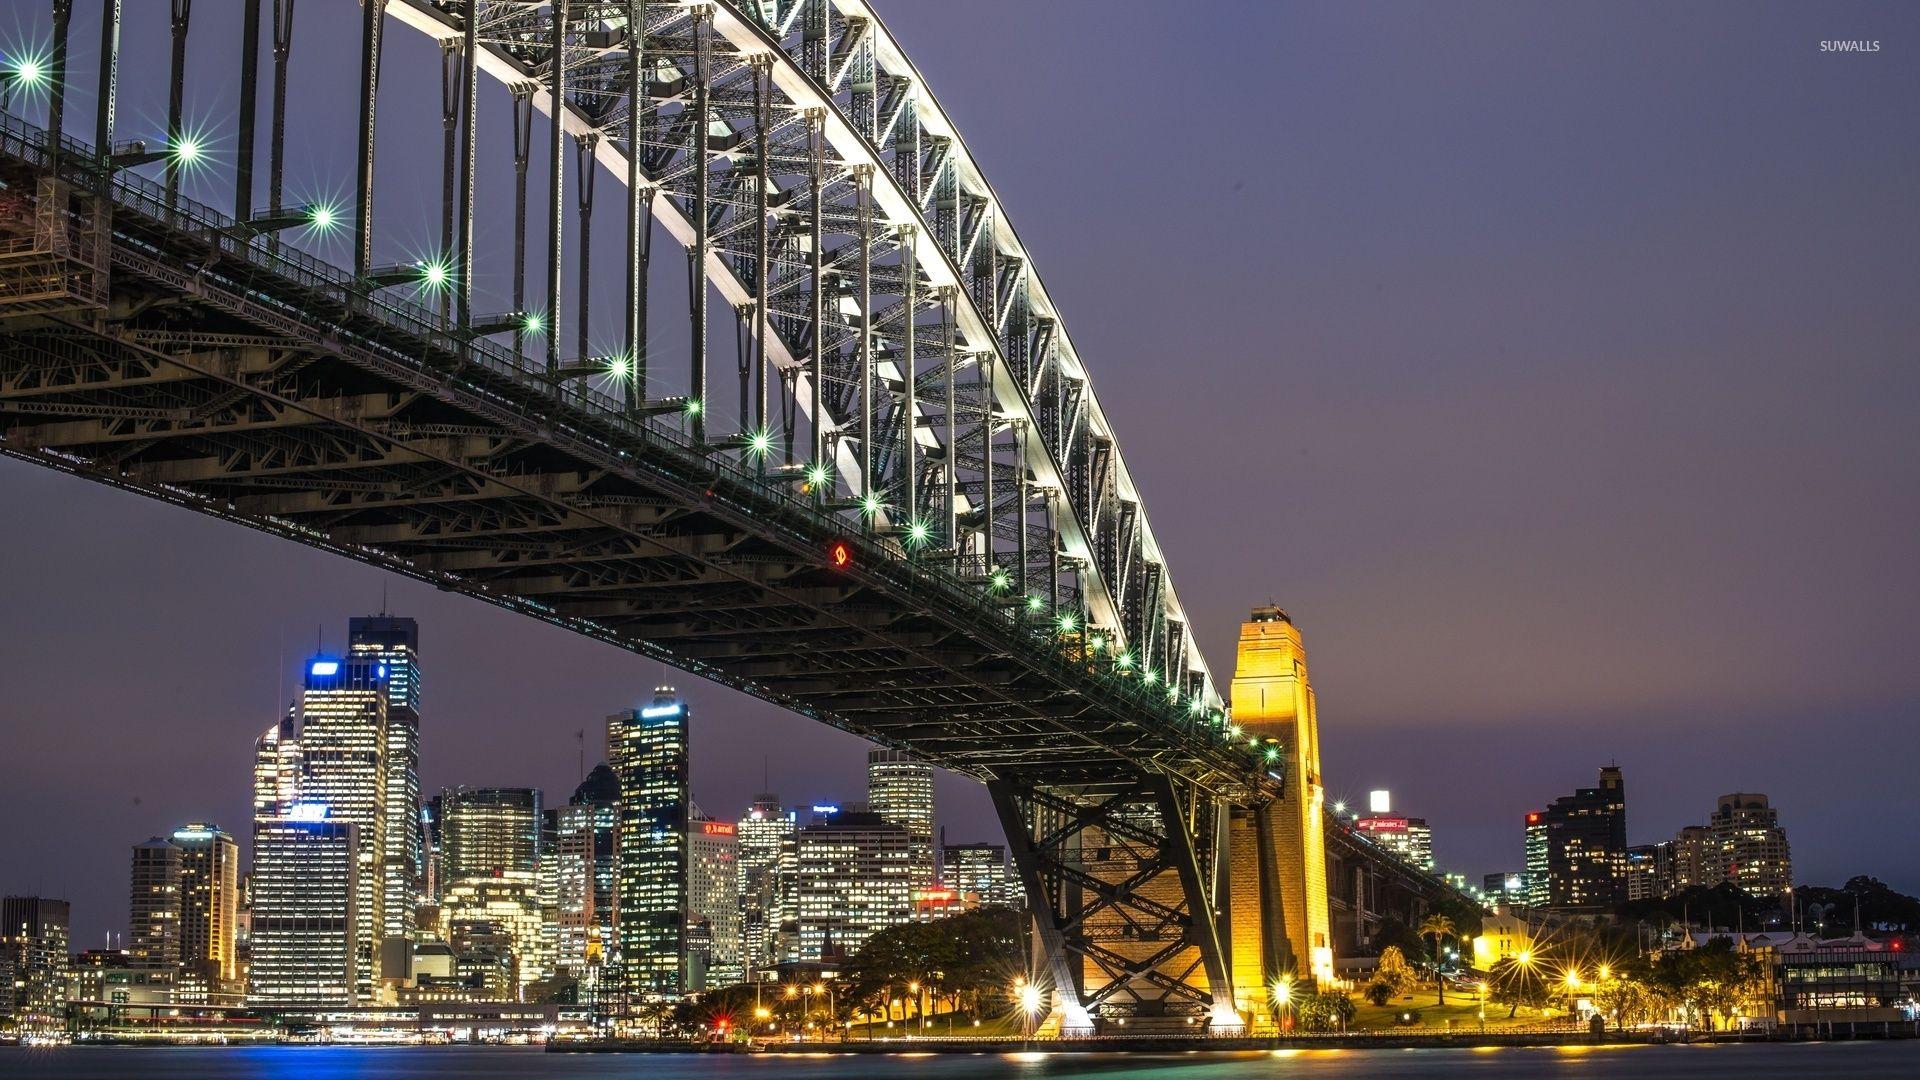 Sydney Opera House And Harbour Bridge At Night Wallpaper